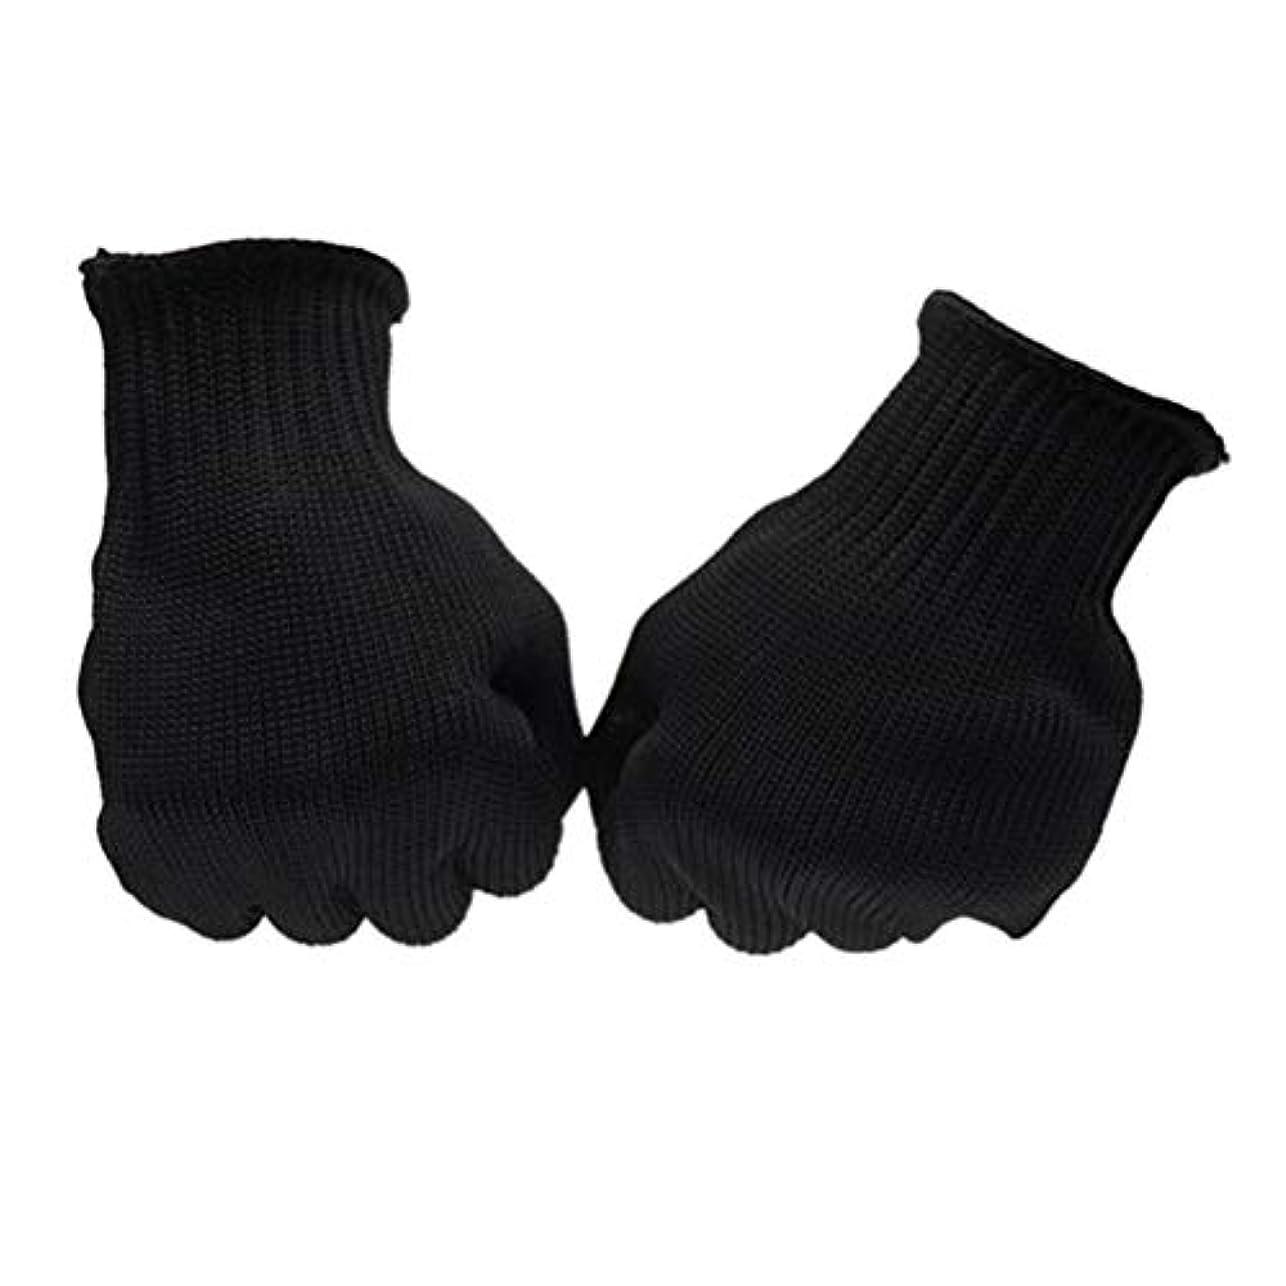 現代起業家強調FENICAL ガーデニング用敏感な作業用手袋保護用作業用手袋